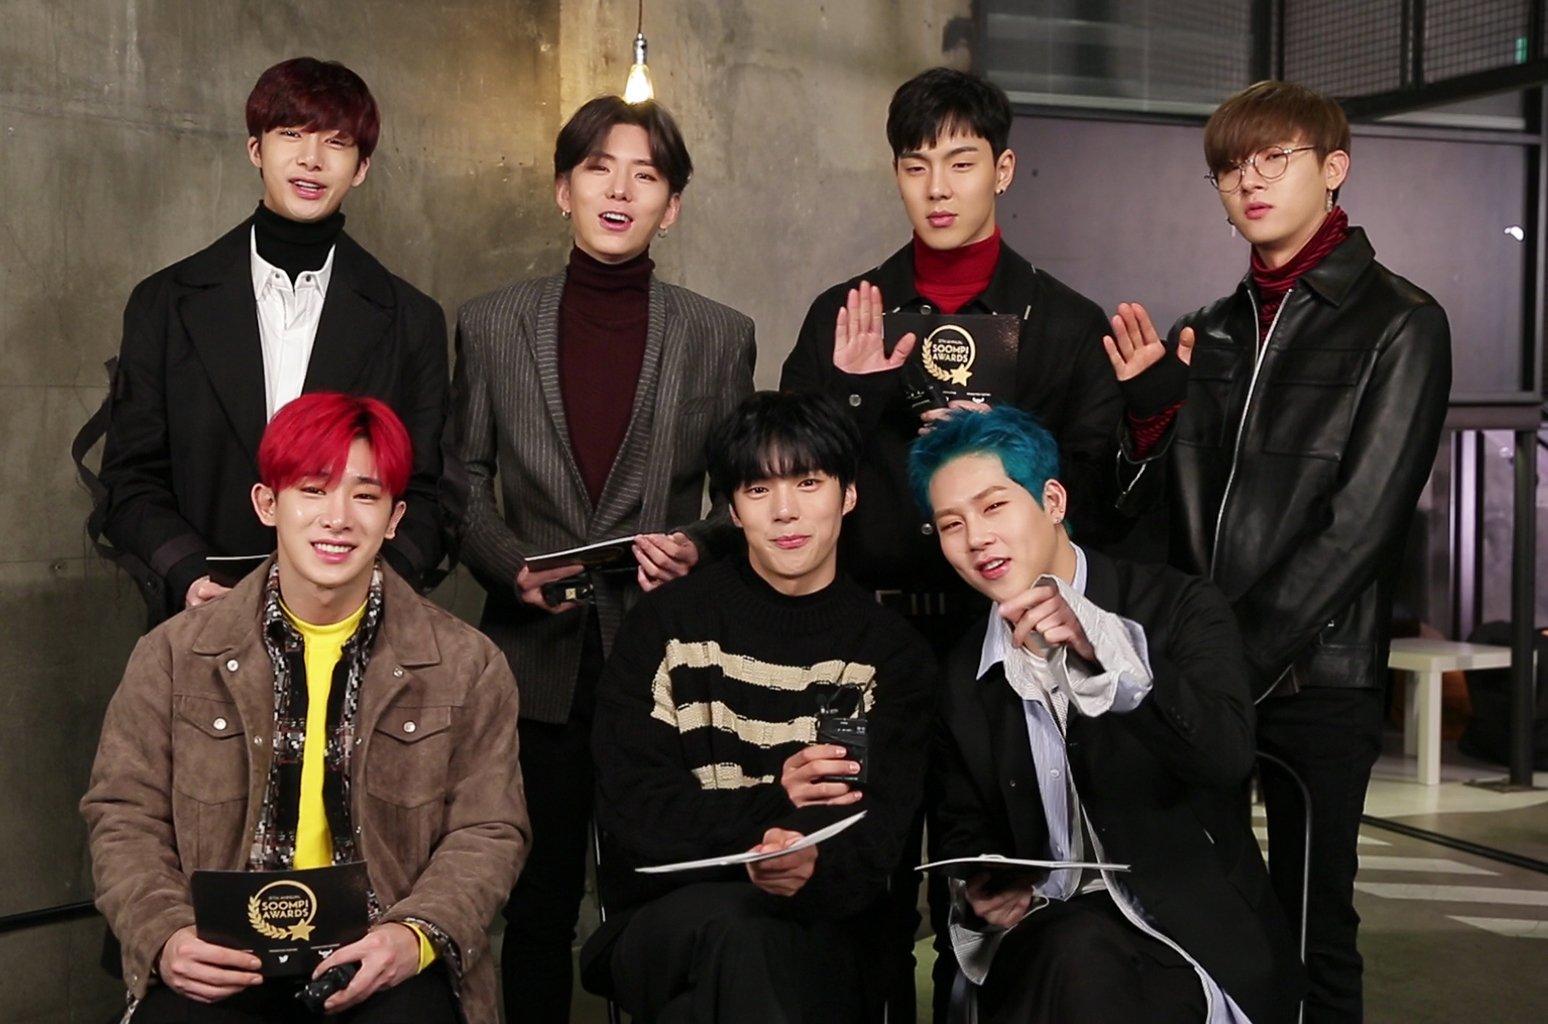 BTS, GOT7 & more K-pop acts win big at Soompi Awards https://t.co/3pFydmmFh3 https://t.co/udmgCX2dkM